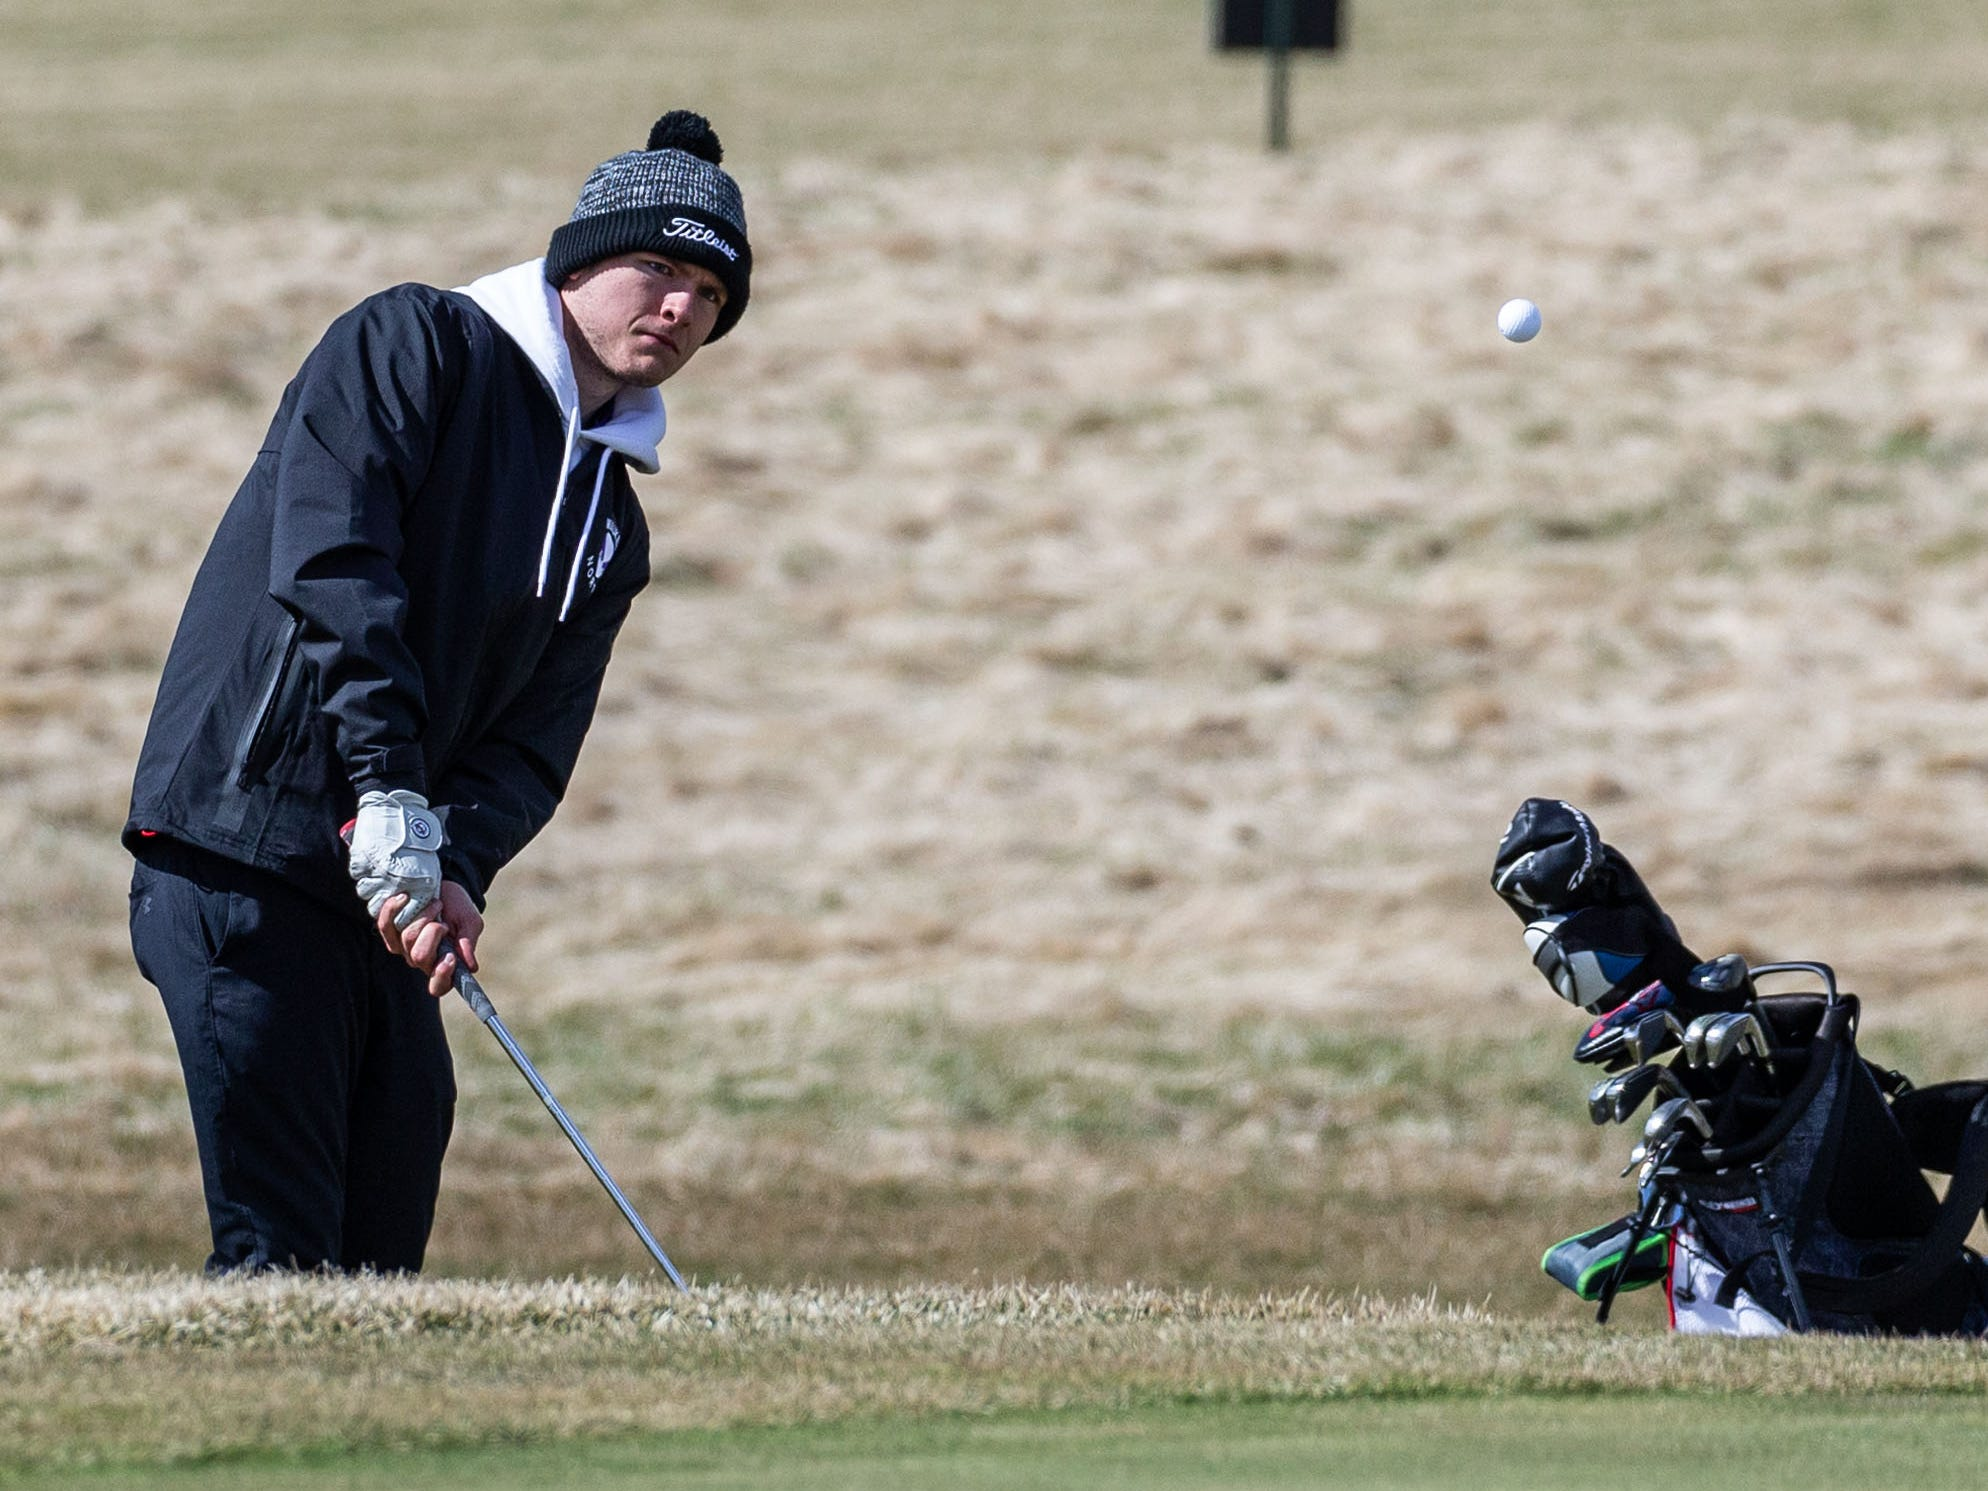 Waukesha North golfer Chris Barnett competes in the Catholic Memorial 2019 Crusader Invitational at Broadlands Golf Club in North Prairie on Saturday, April 13, 2019.